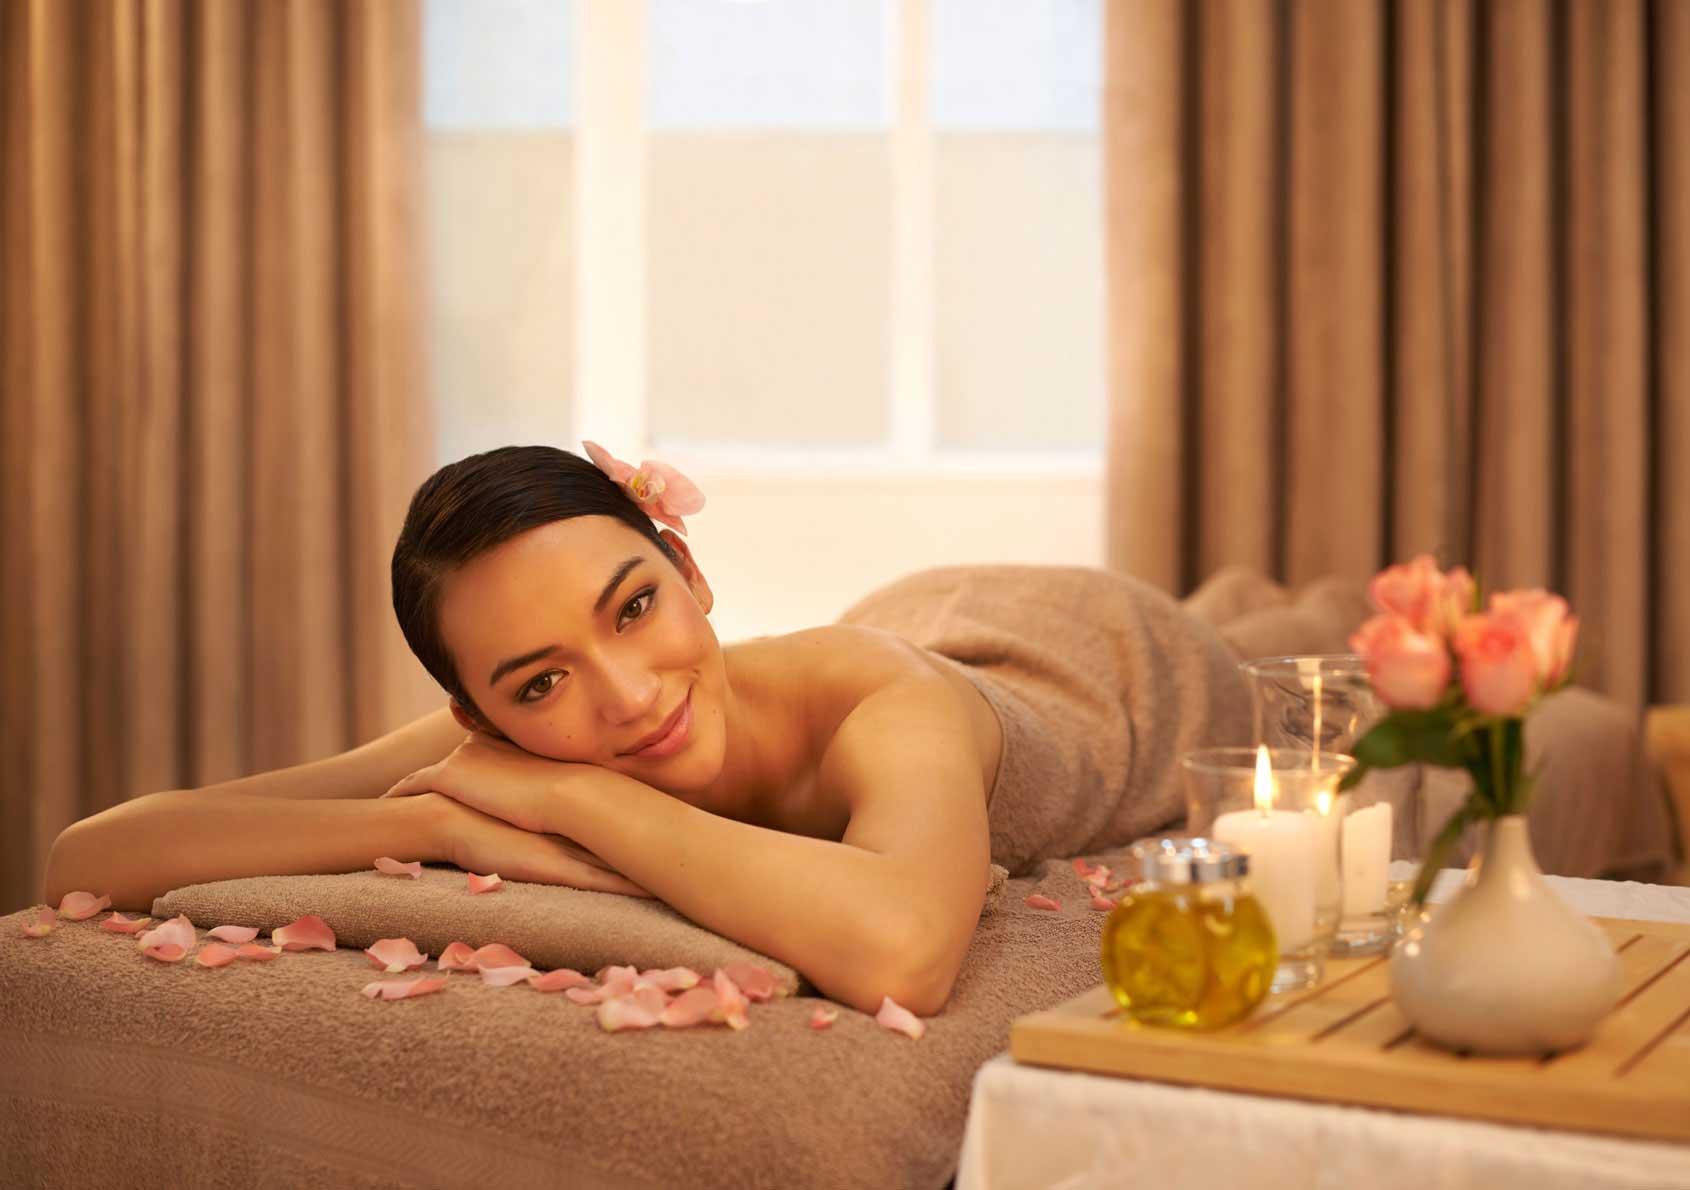 Thai massage holstebro annonceligth